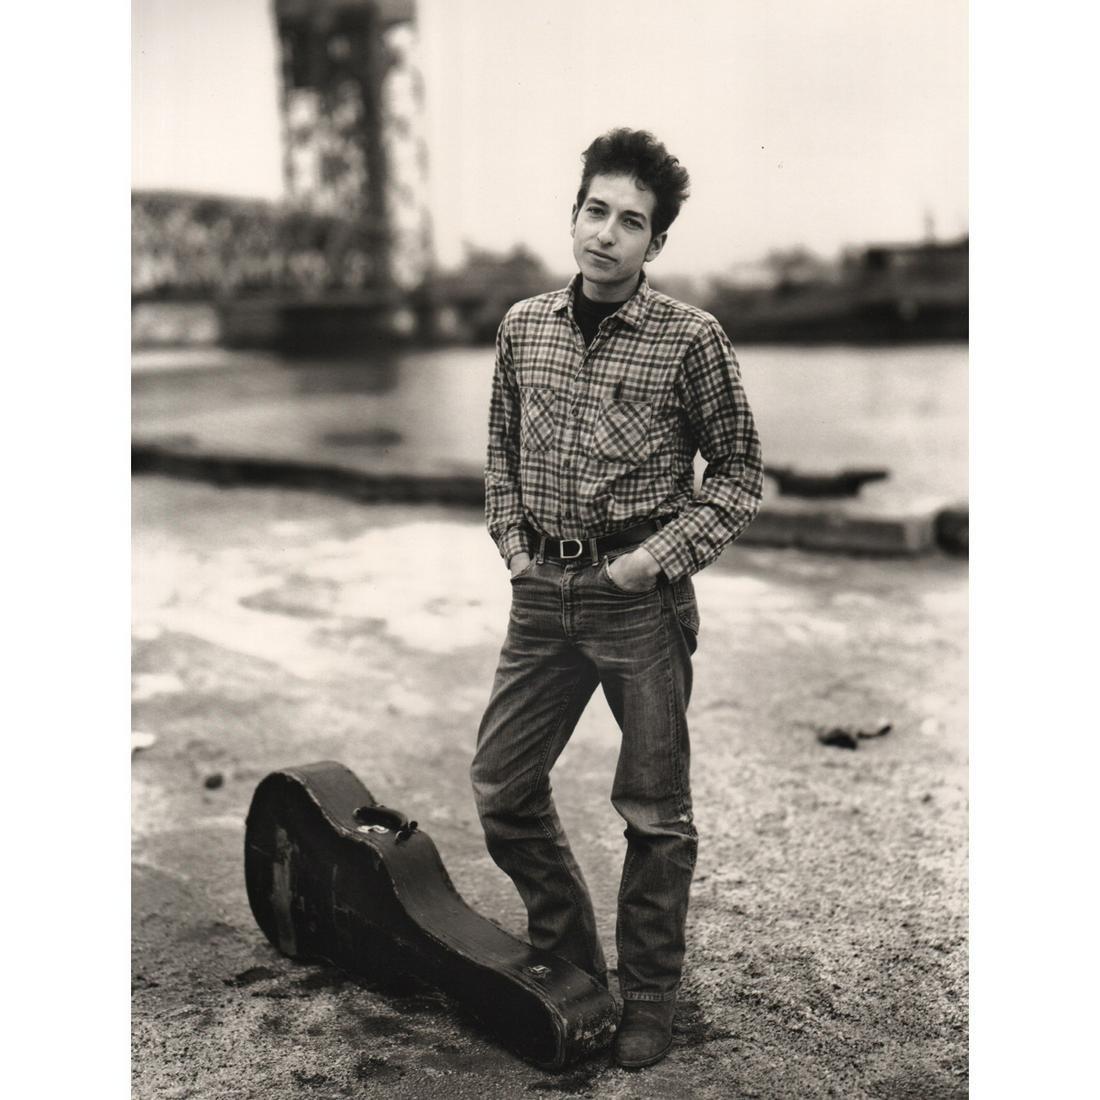 RICHARD AVEDON - Bob Dylan, NY 1963